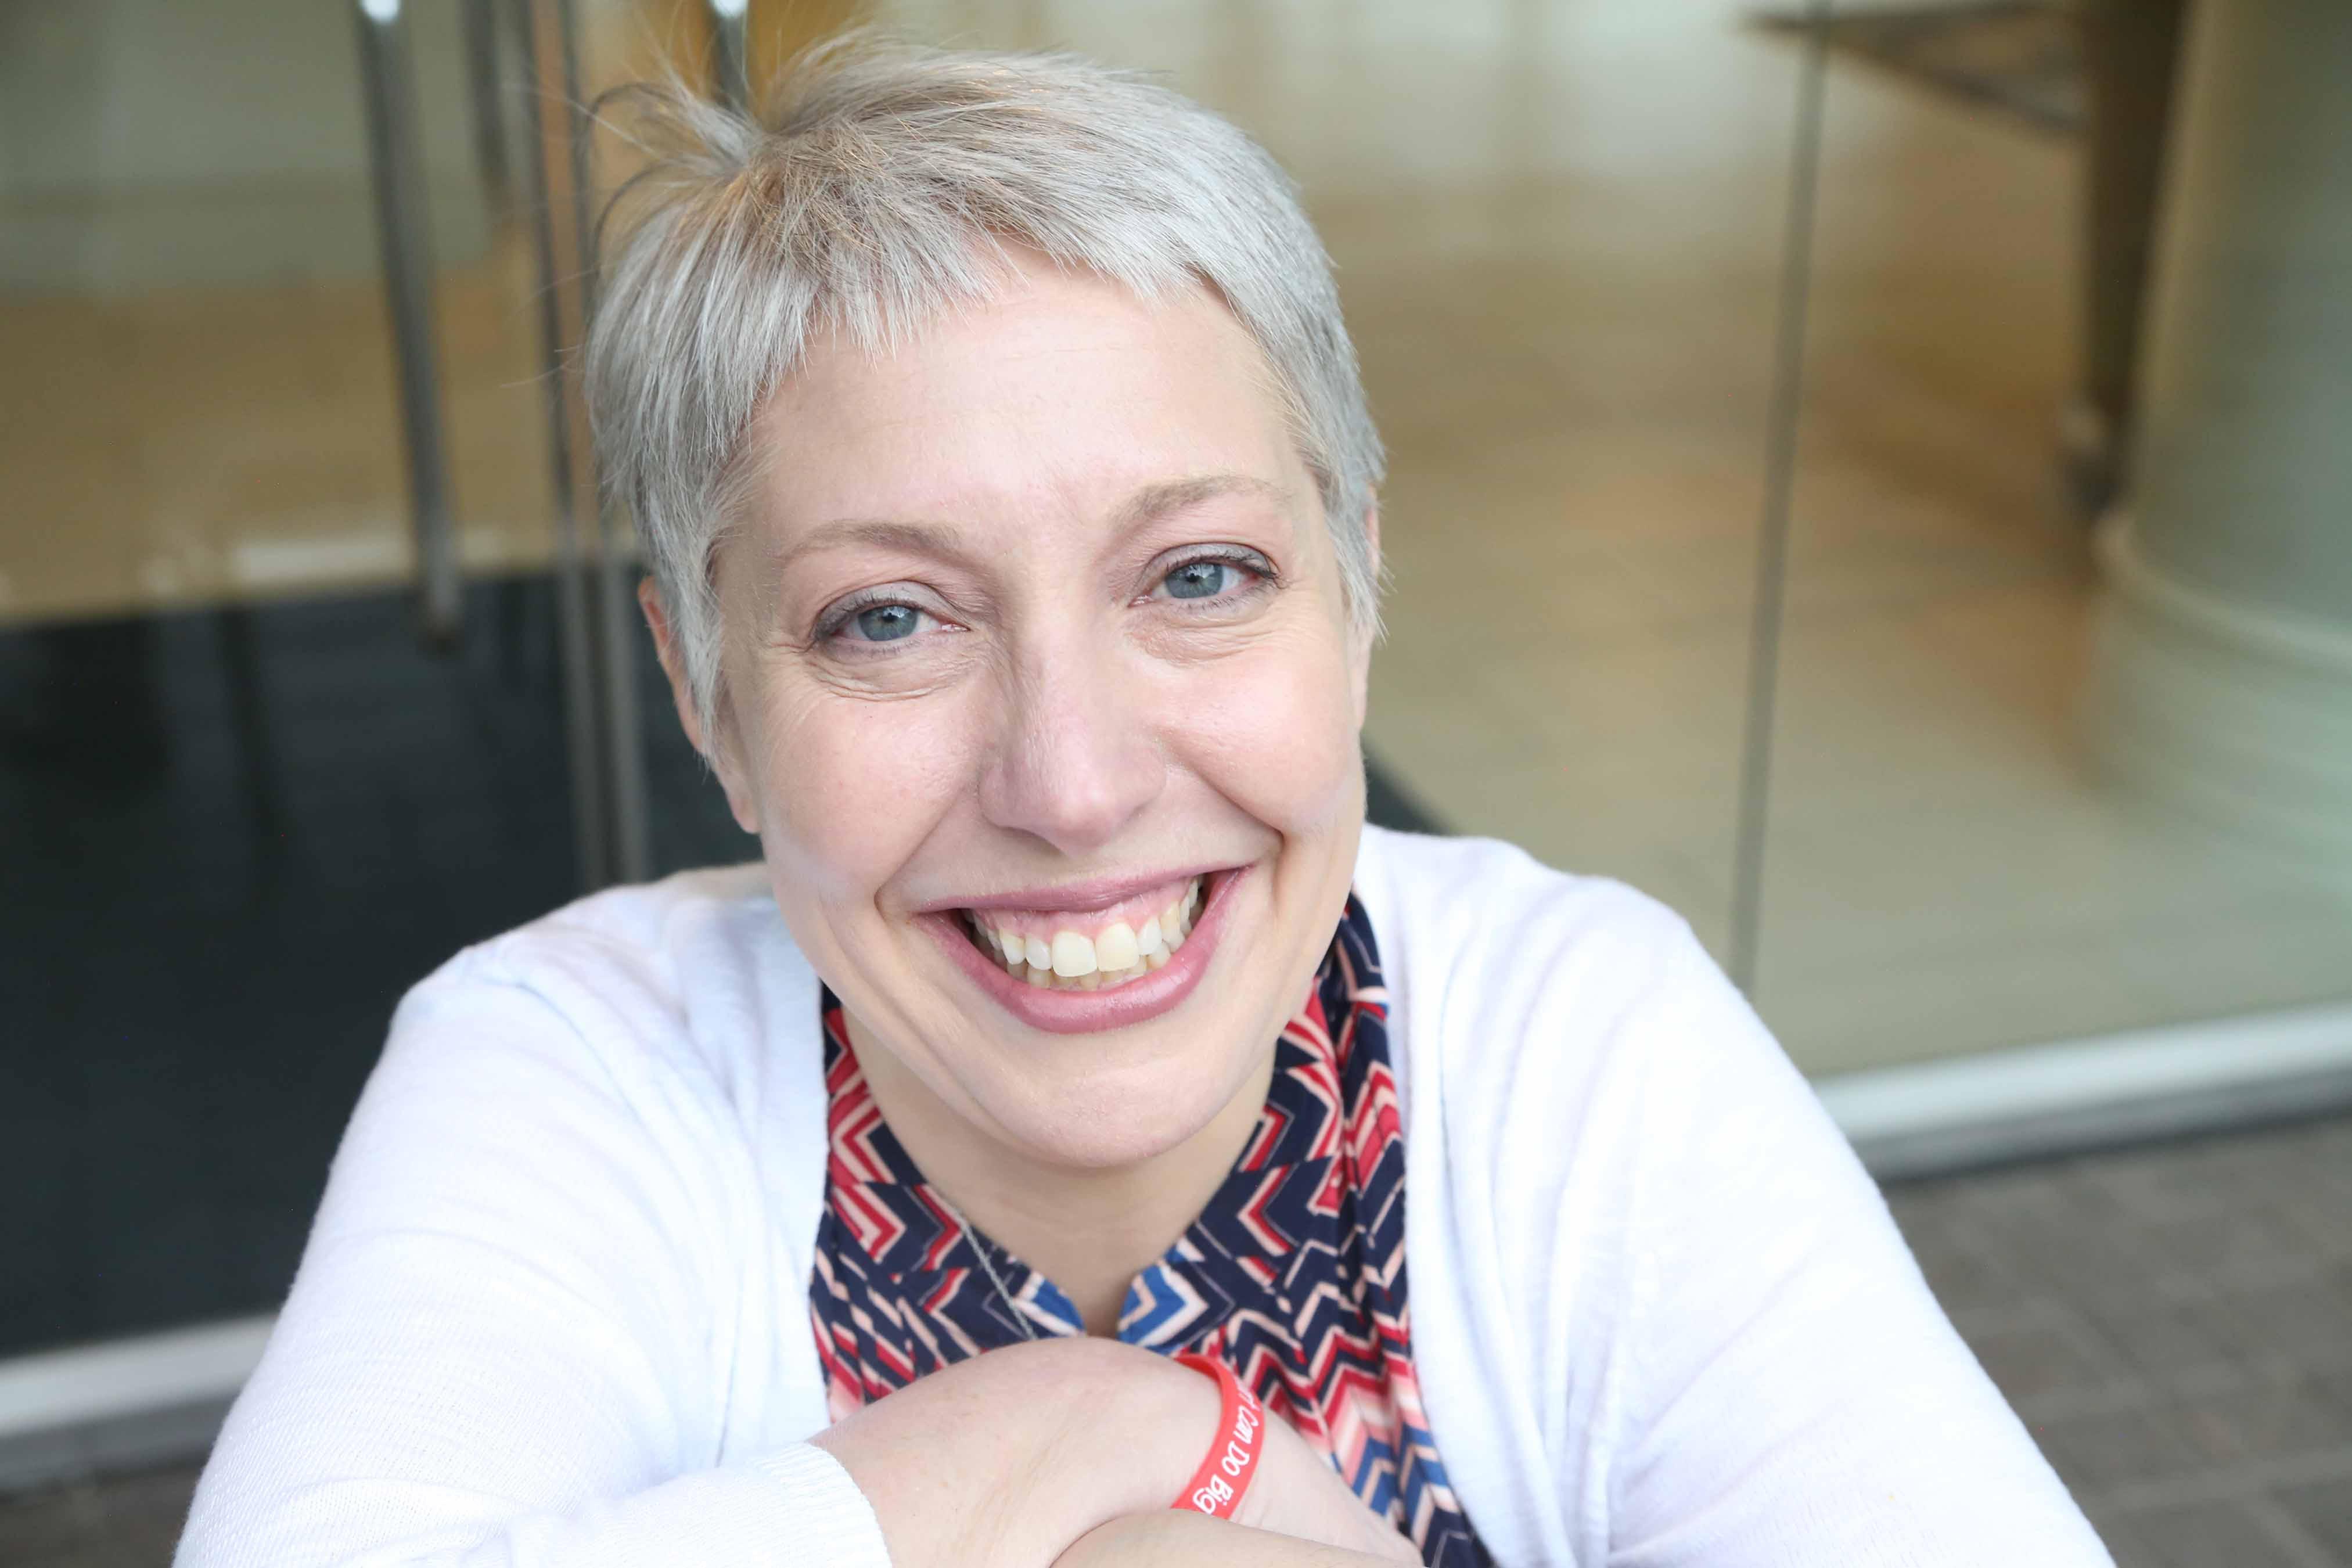 Psoriatic Arthritis Community Advocate Julie Greenwood